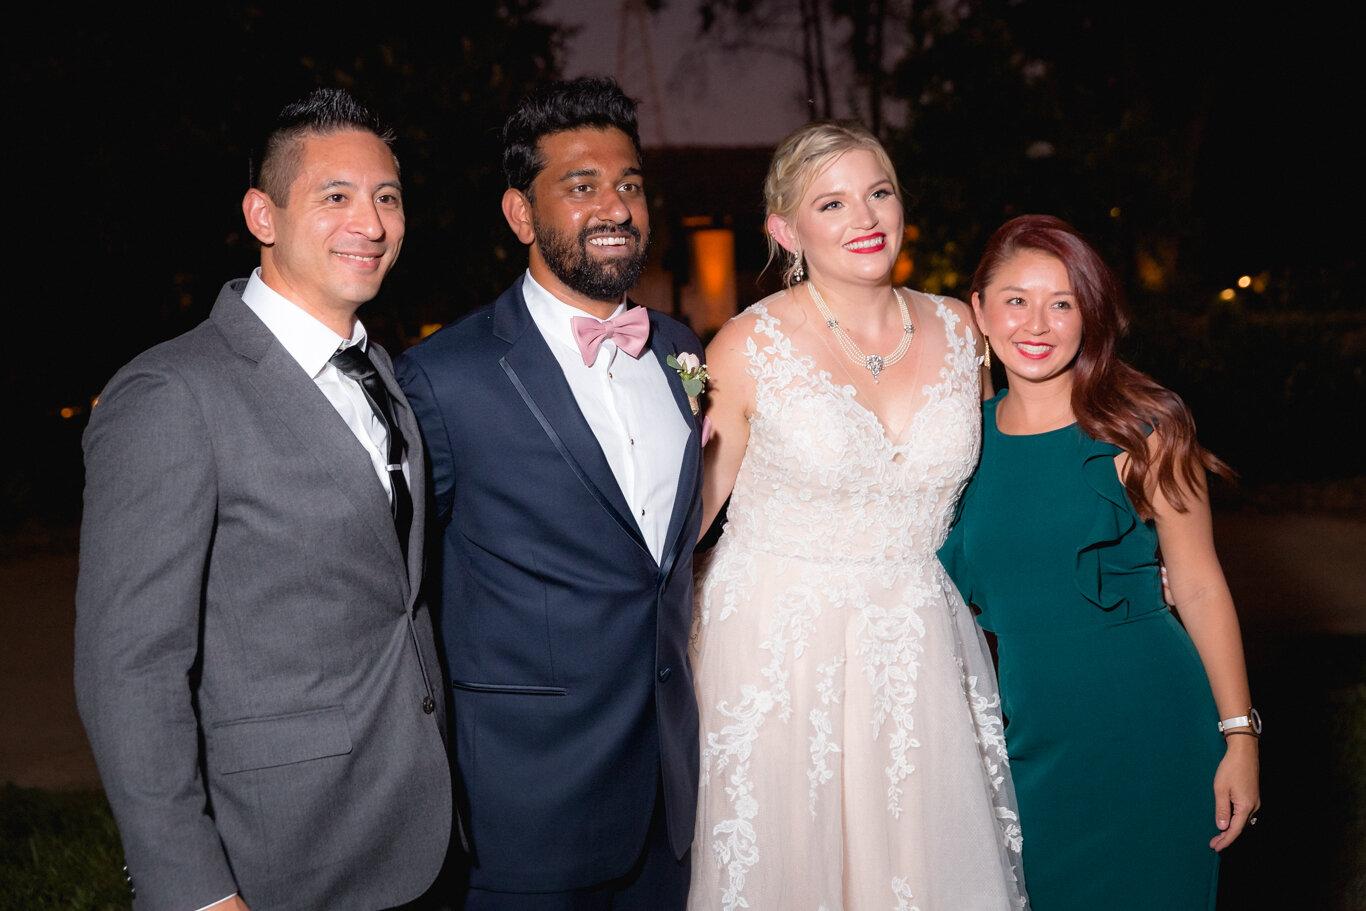 2019.08.24_Emily-Ashir-Wedding-at-the-Maples-6382.jpg